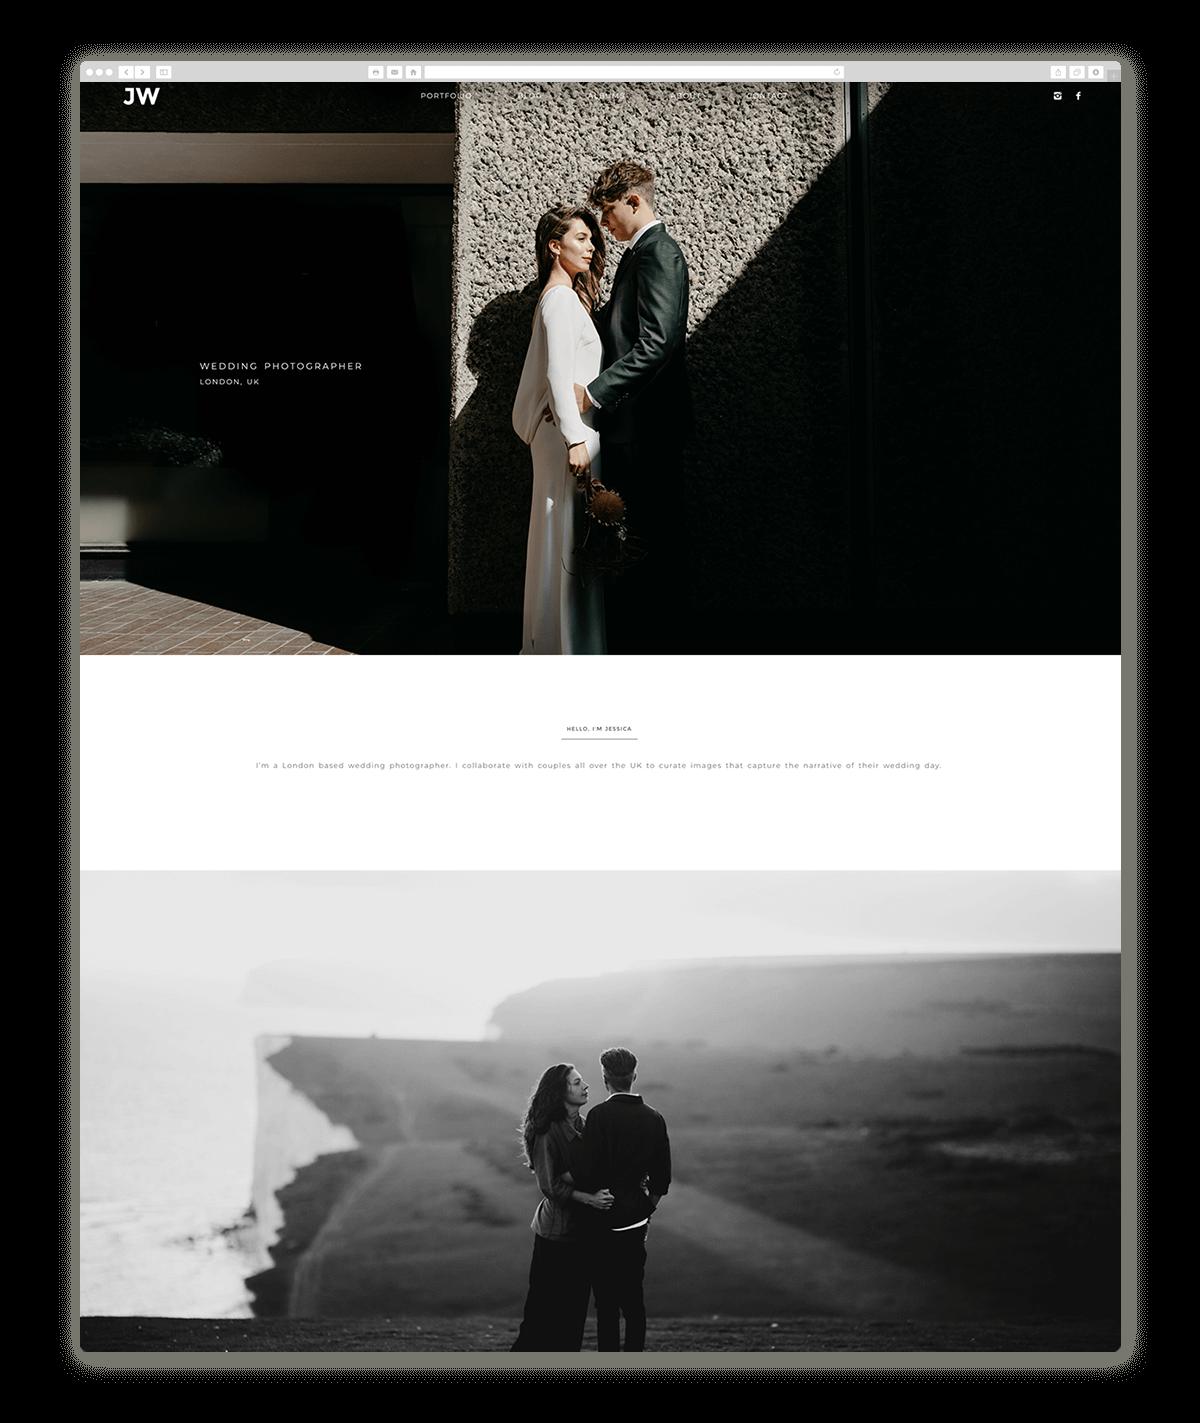 jessica-williams-photography